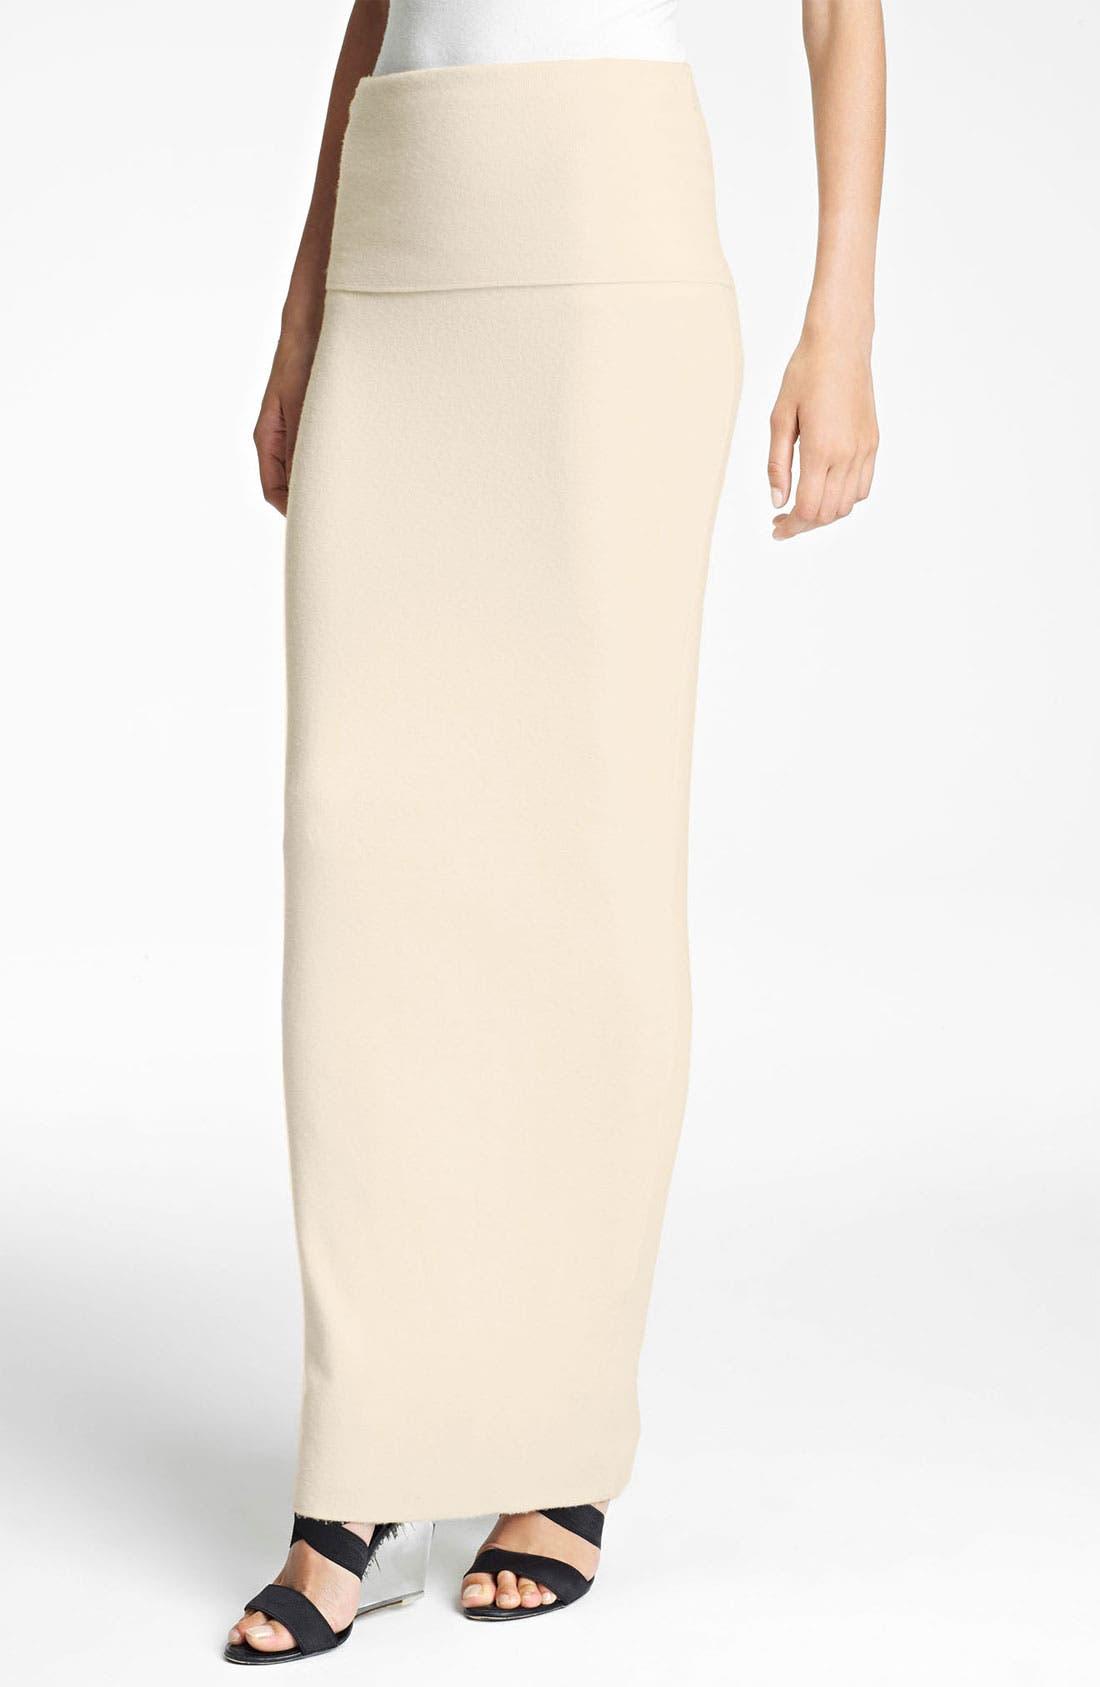 Main Image - Donna Karan Collection 'First Layer' Cashmere Blend Maxi Skirt